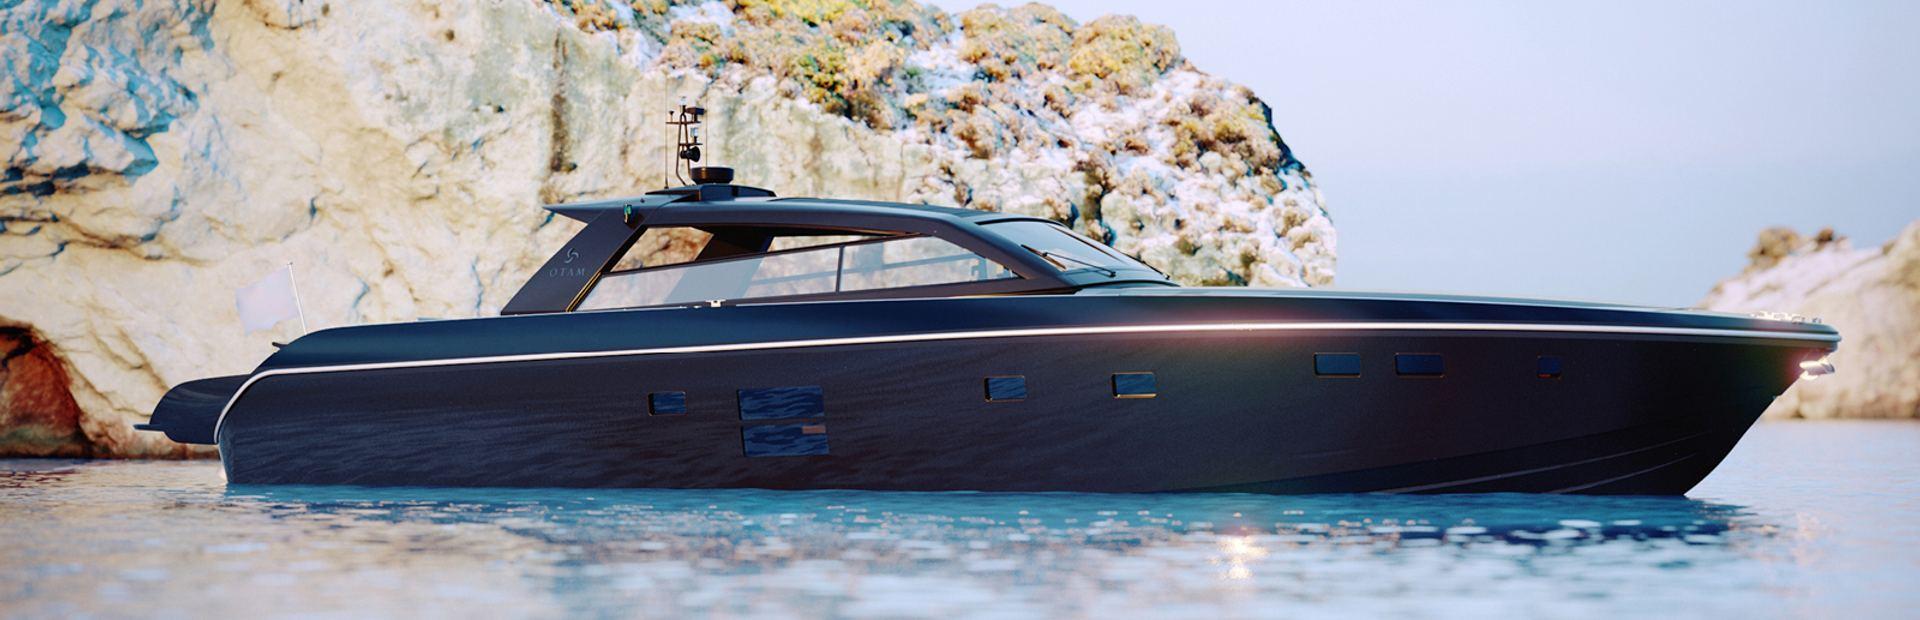 Otam 85 GTS Yacht Charter